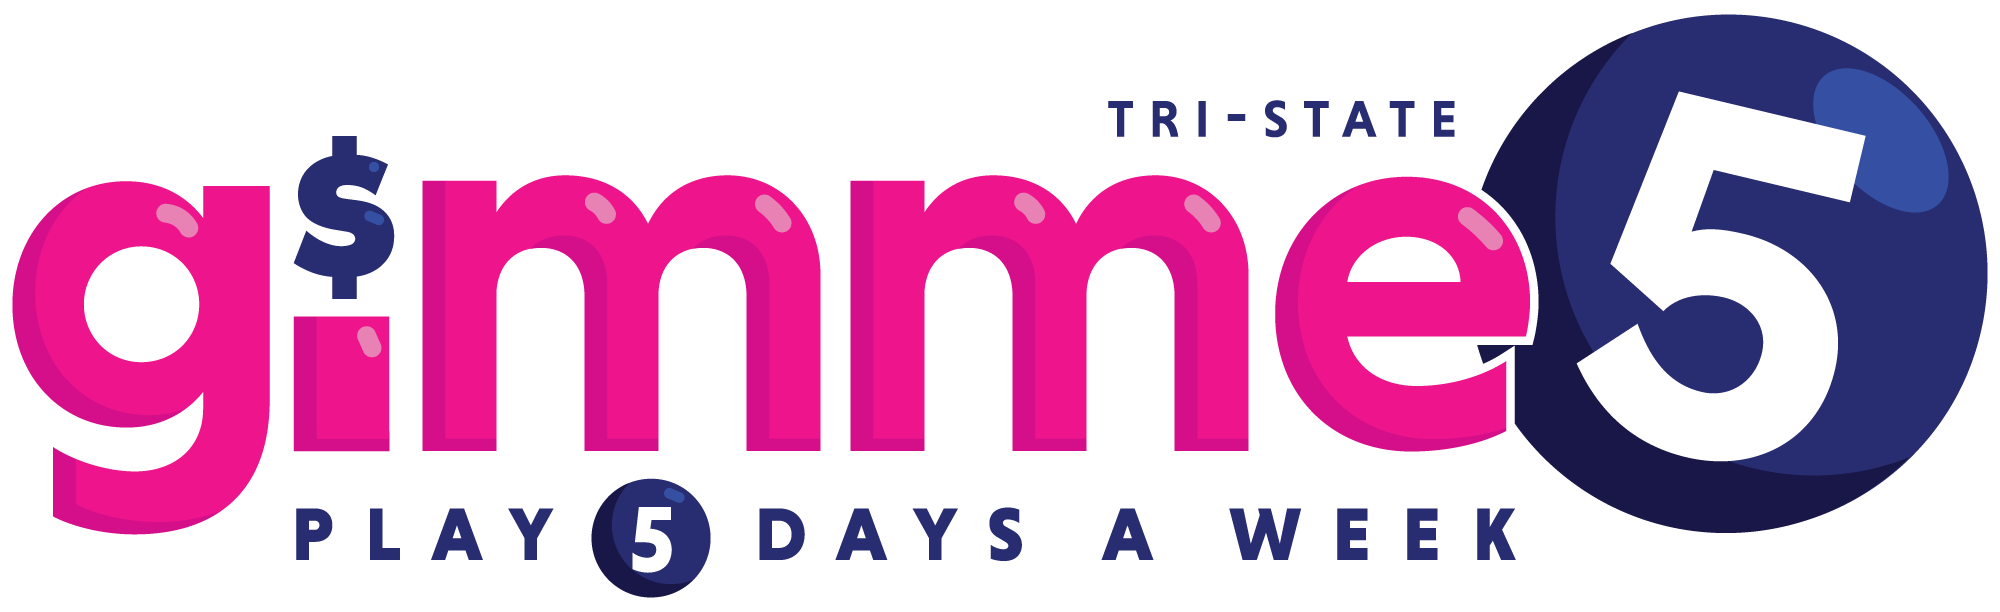 new gimme 5 logo